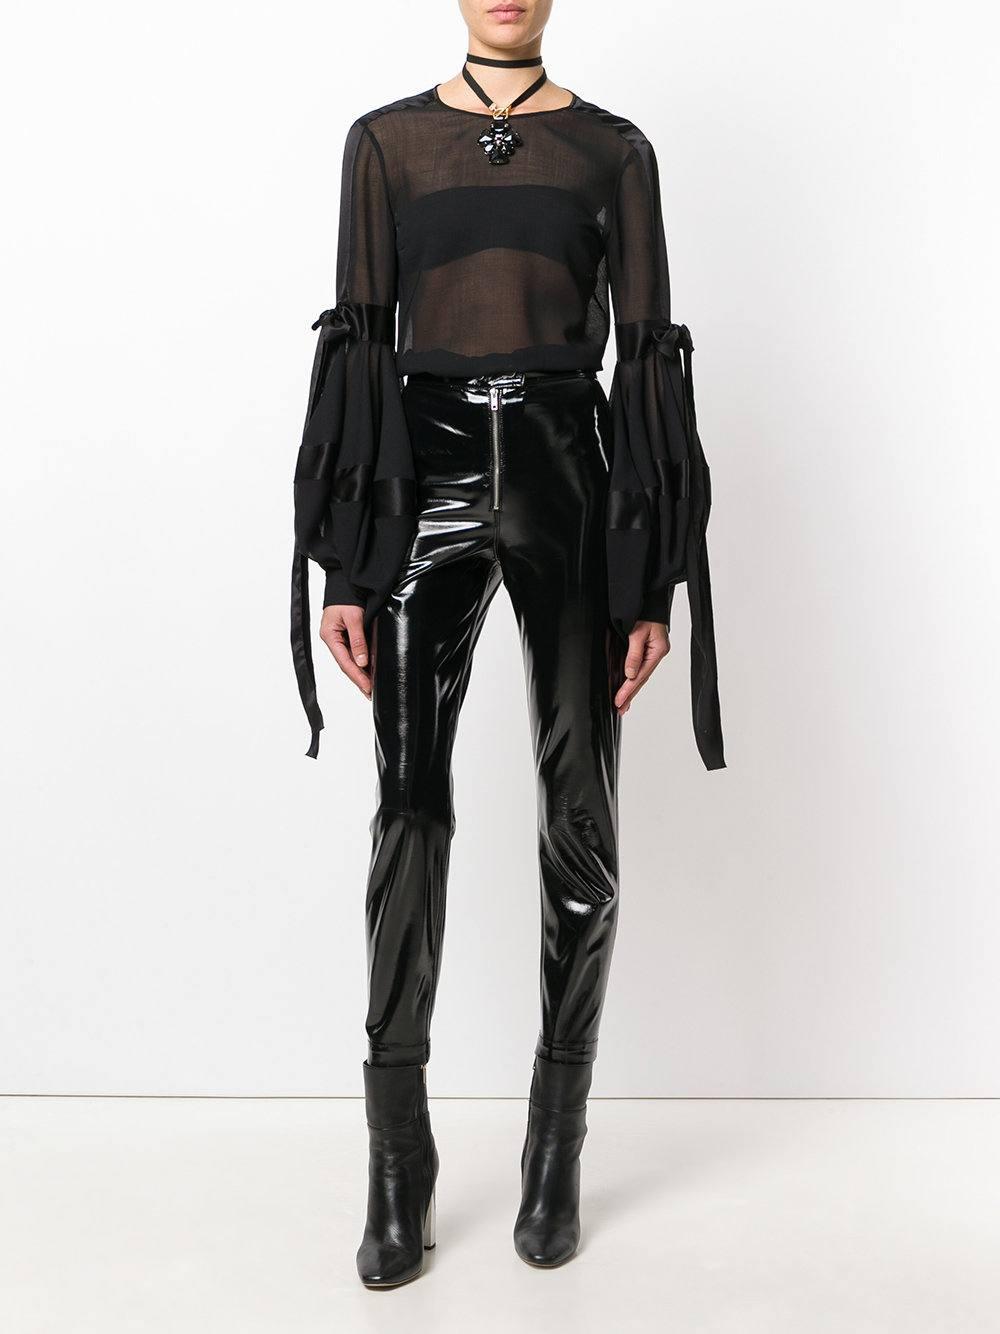 modniye-bluzki-iz-shifona-foto-28 Жми! Модные блузки из шифона 2019-2020 года тенденции 70 фото